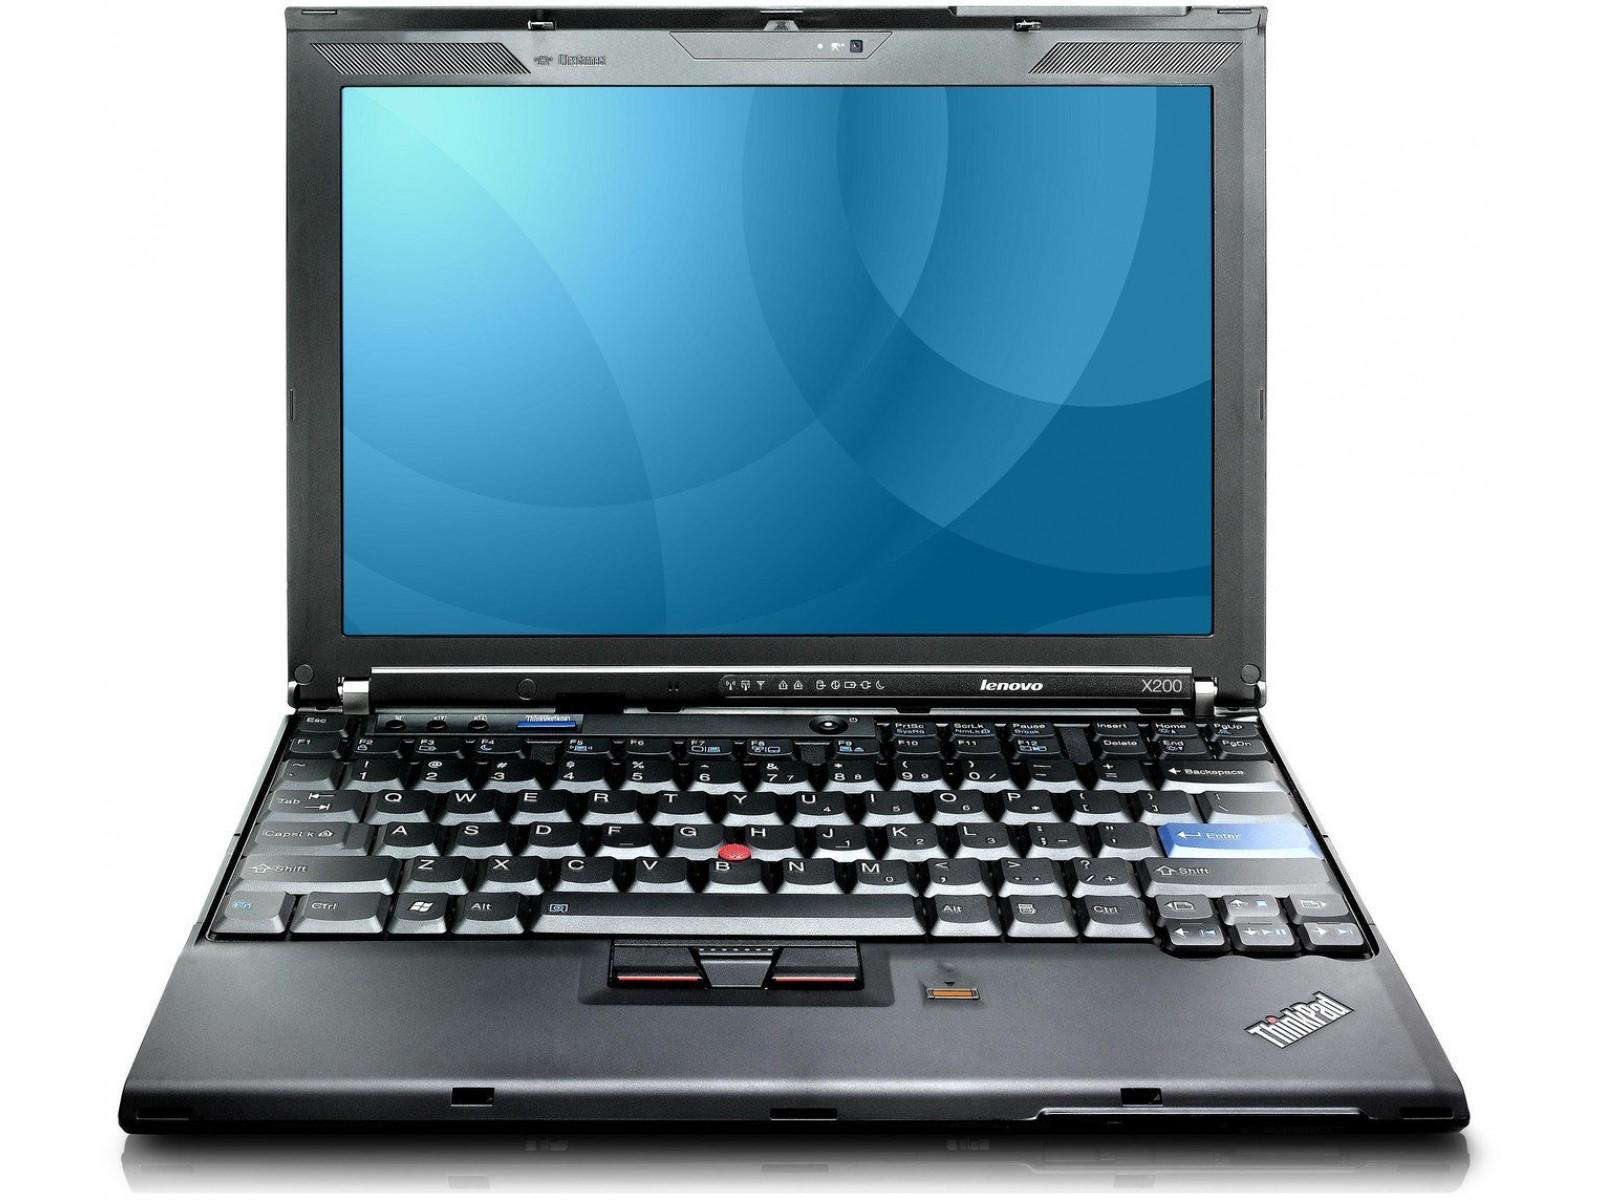 Lenovo ThinkPad X200 Conexant Audio Mac